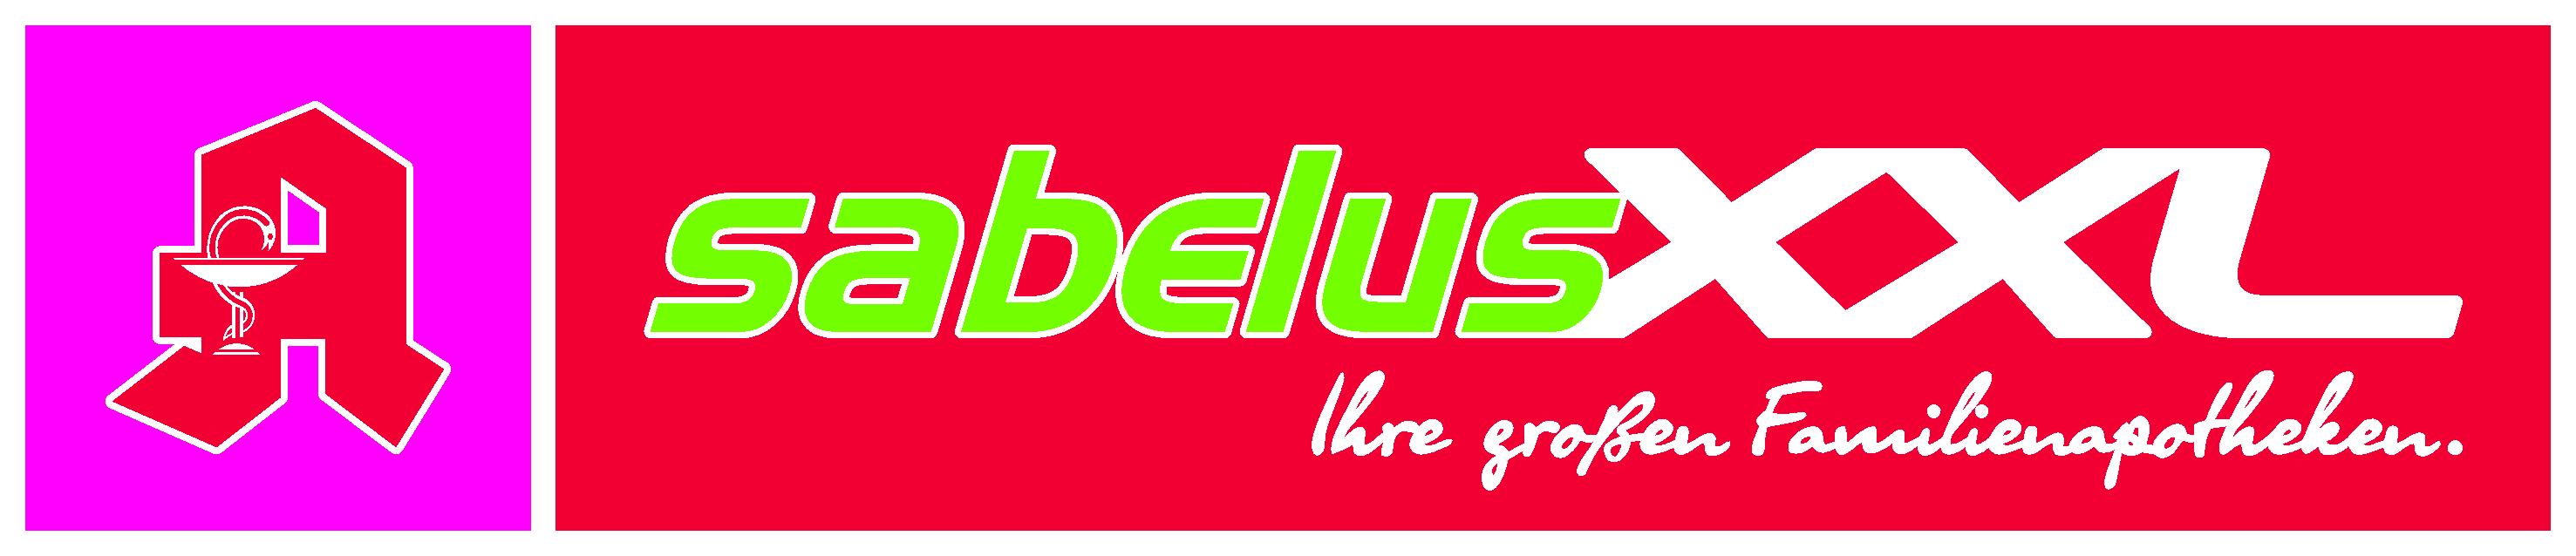 Sabelus xxl neu  logo